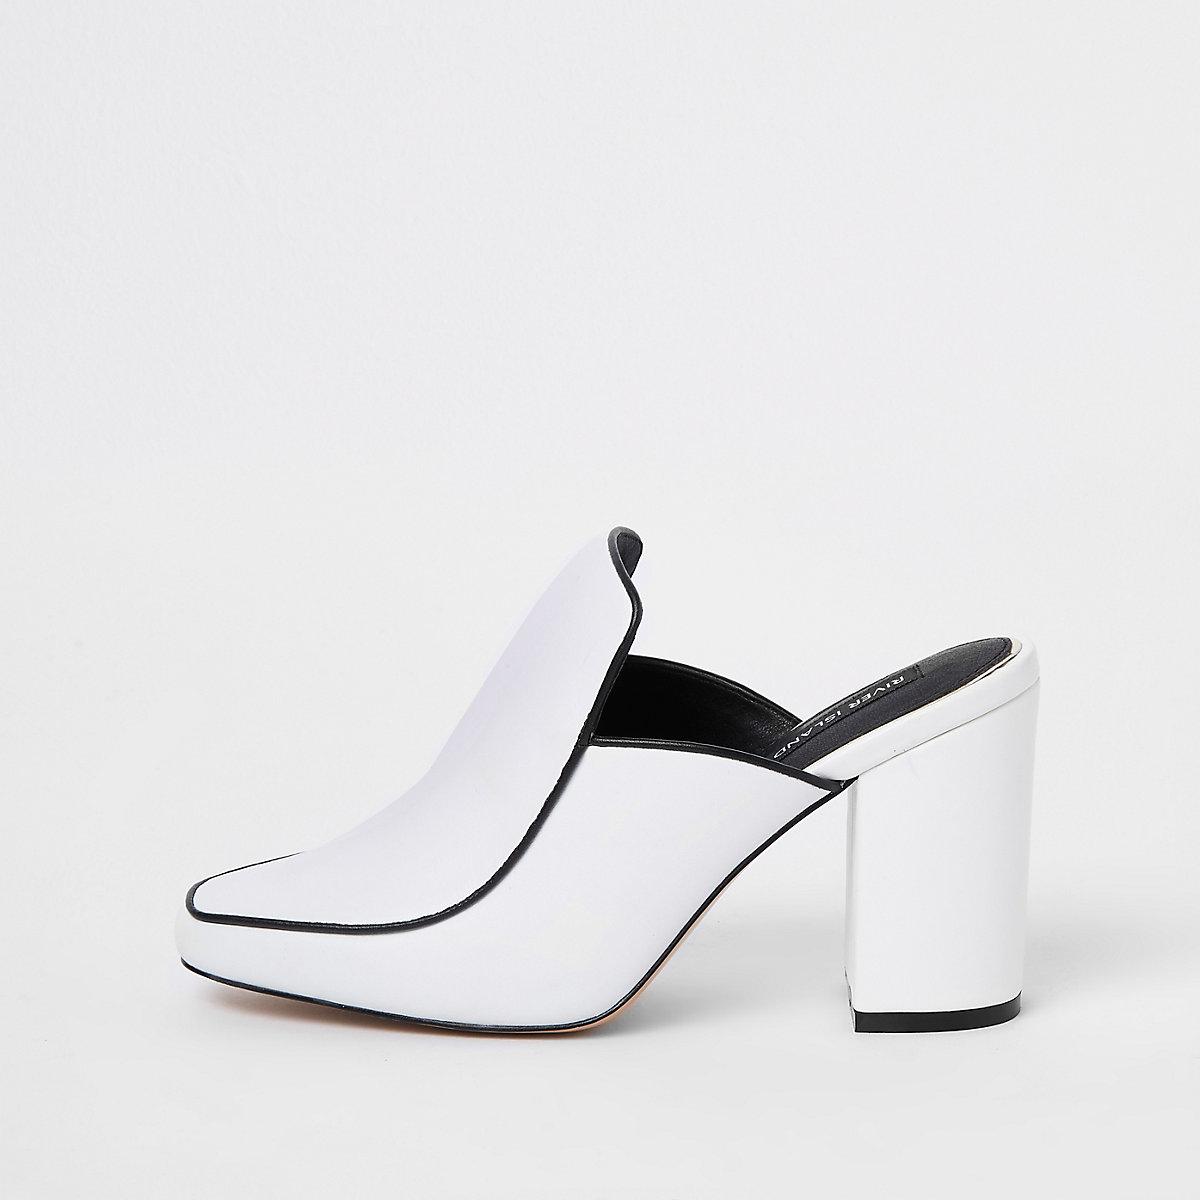 White leather closed toe mules